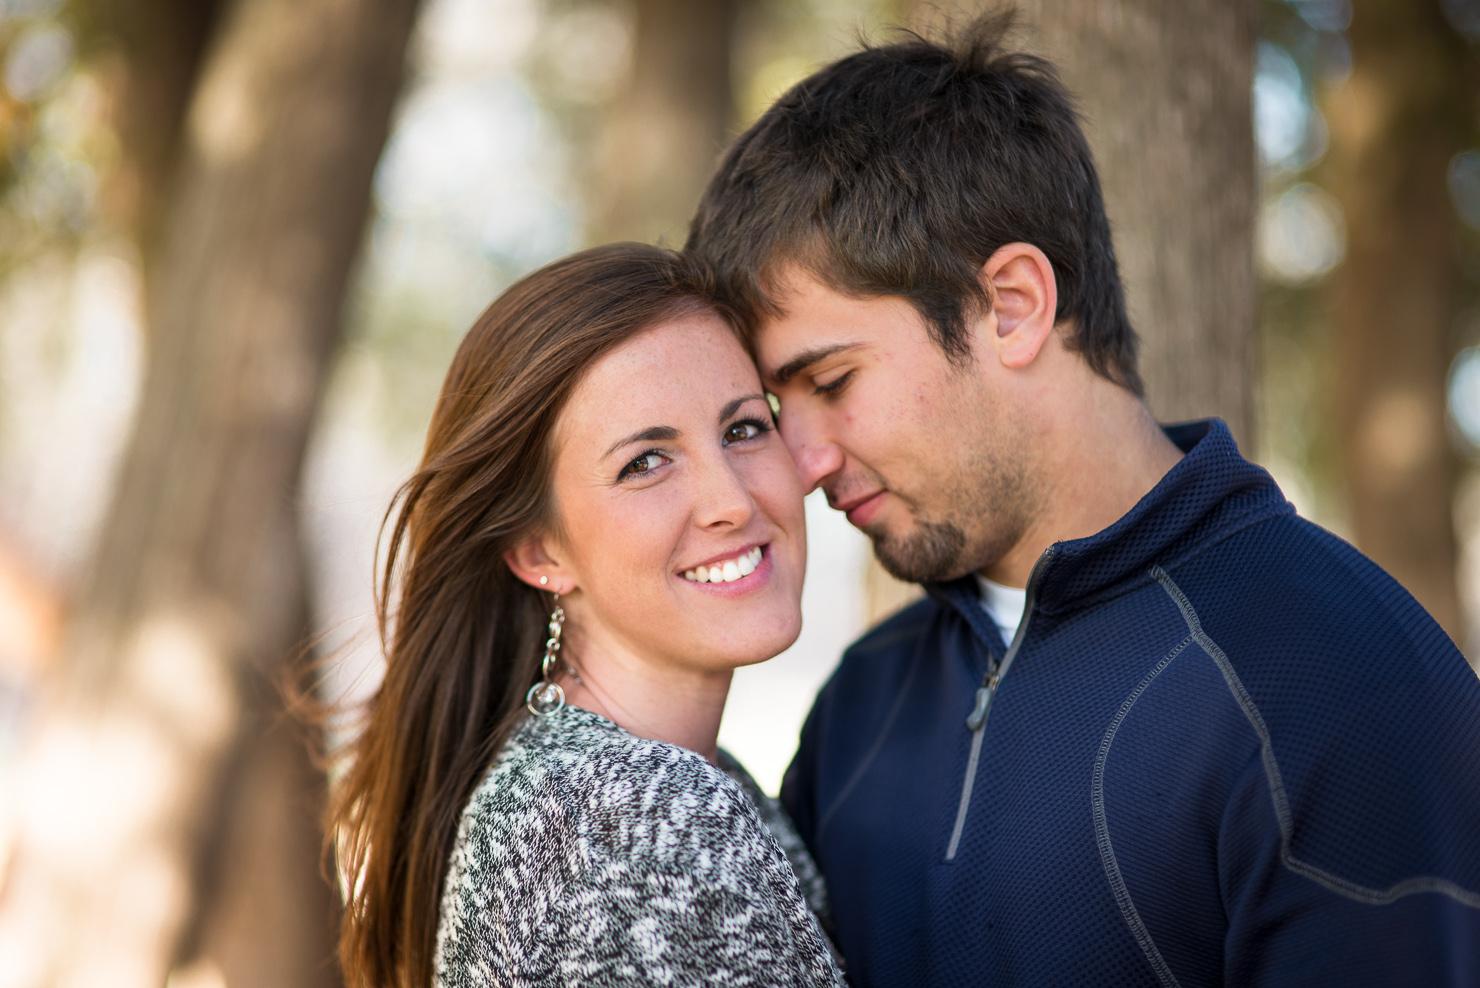 Fredericksburg dating